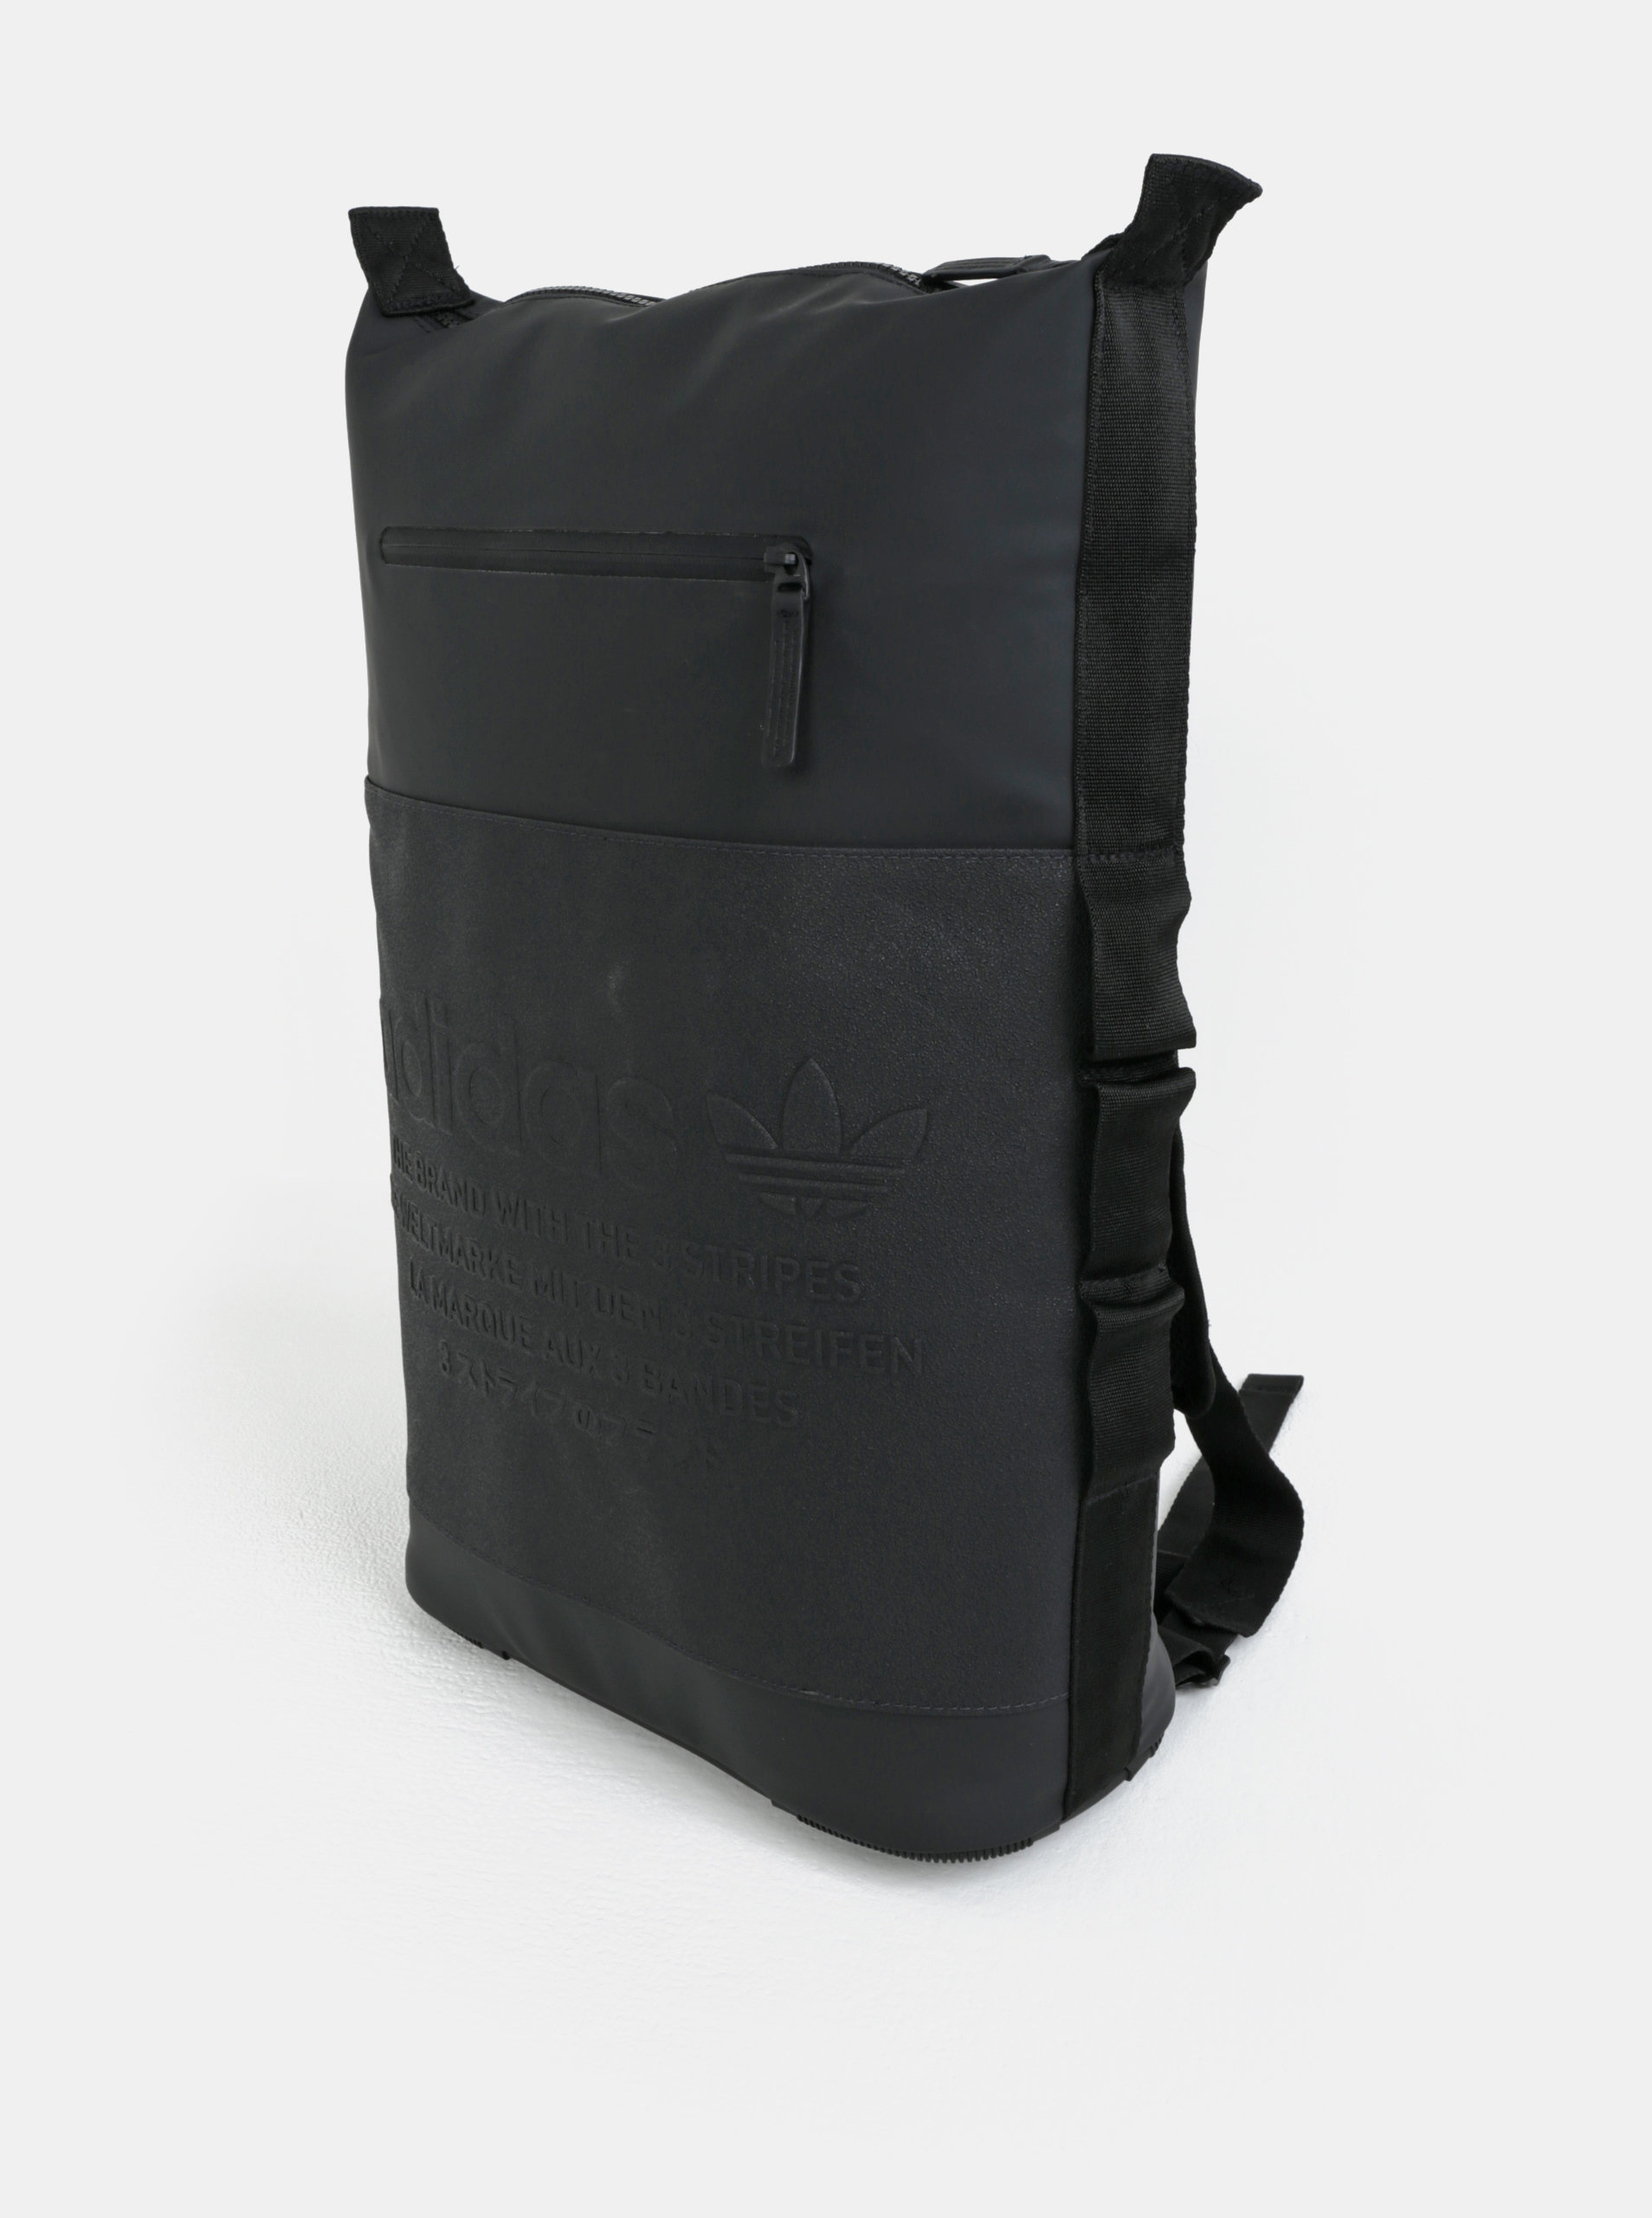 Černý nepromokavý batoh adidas Originals NMD ... 2679d04f6a